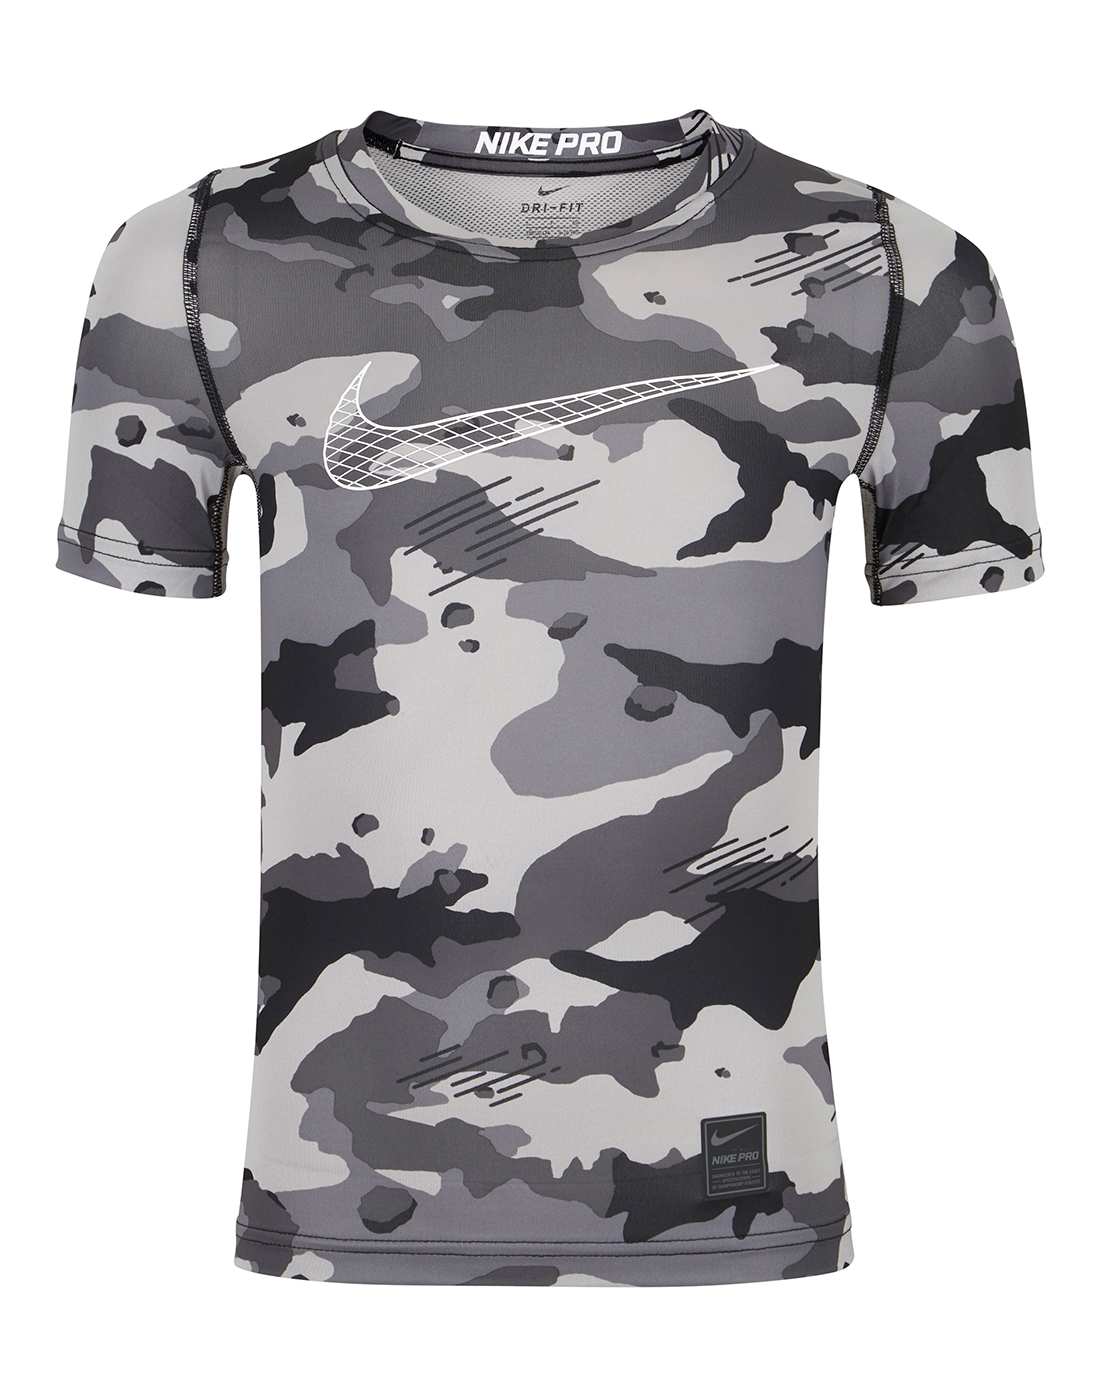 e3370ec50 Boy's Grey Camo Nike Pro T-Shirt | Life Style Sports